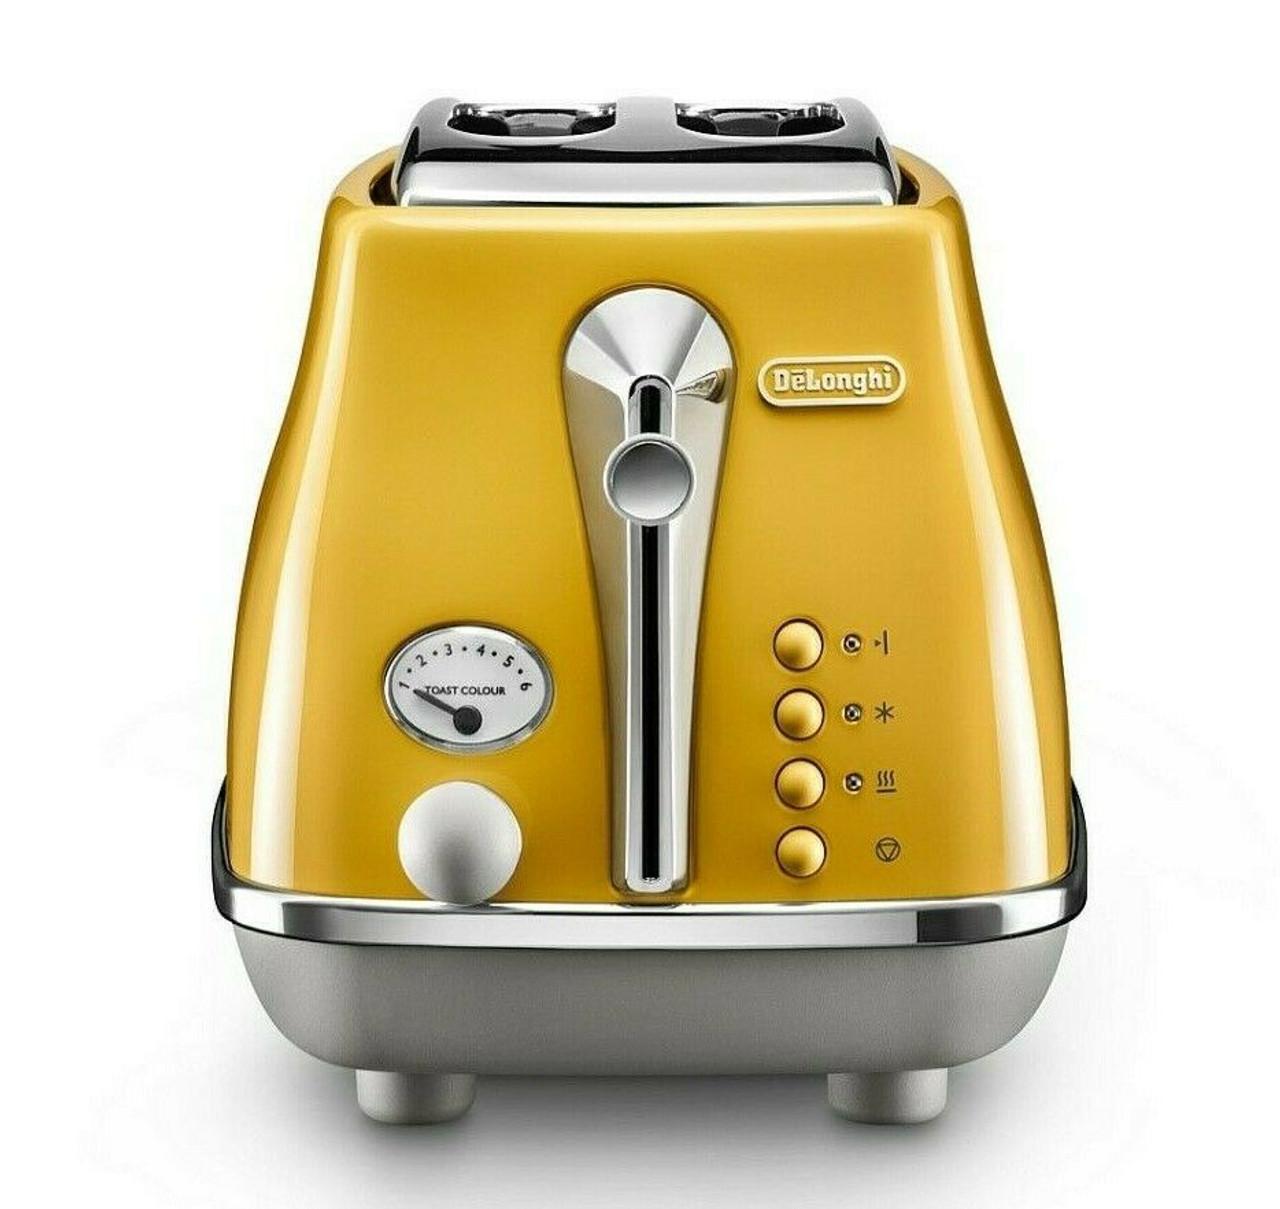 Delonghi CTOC2003Y Icona Capitals 900W 2 Slice Toaster - New York Yellow